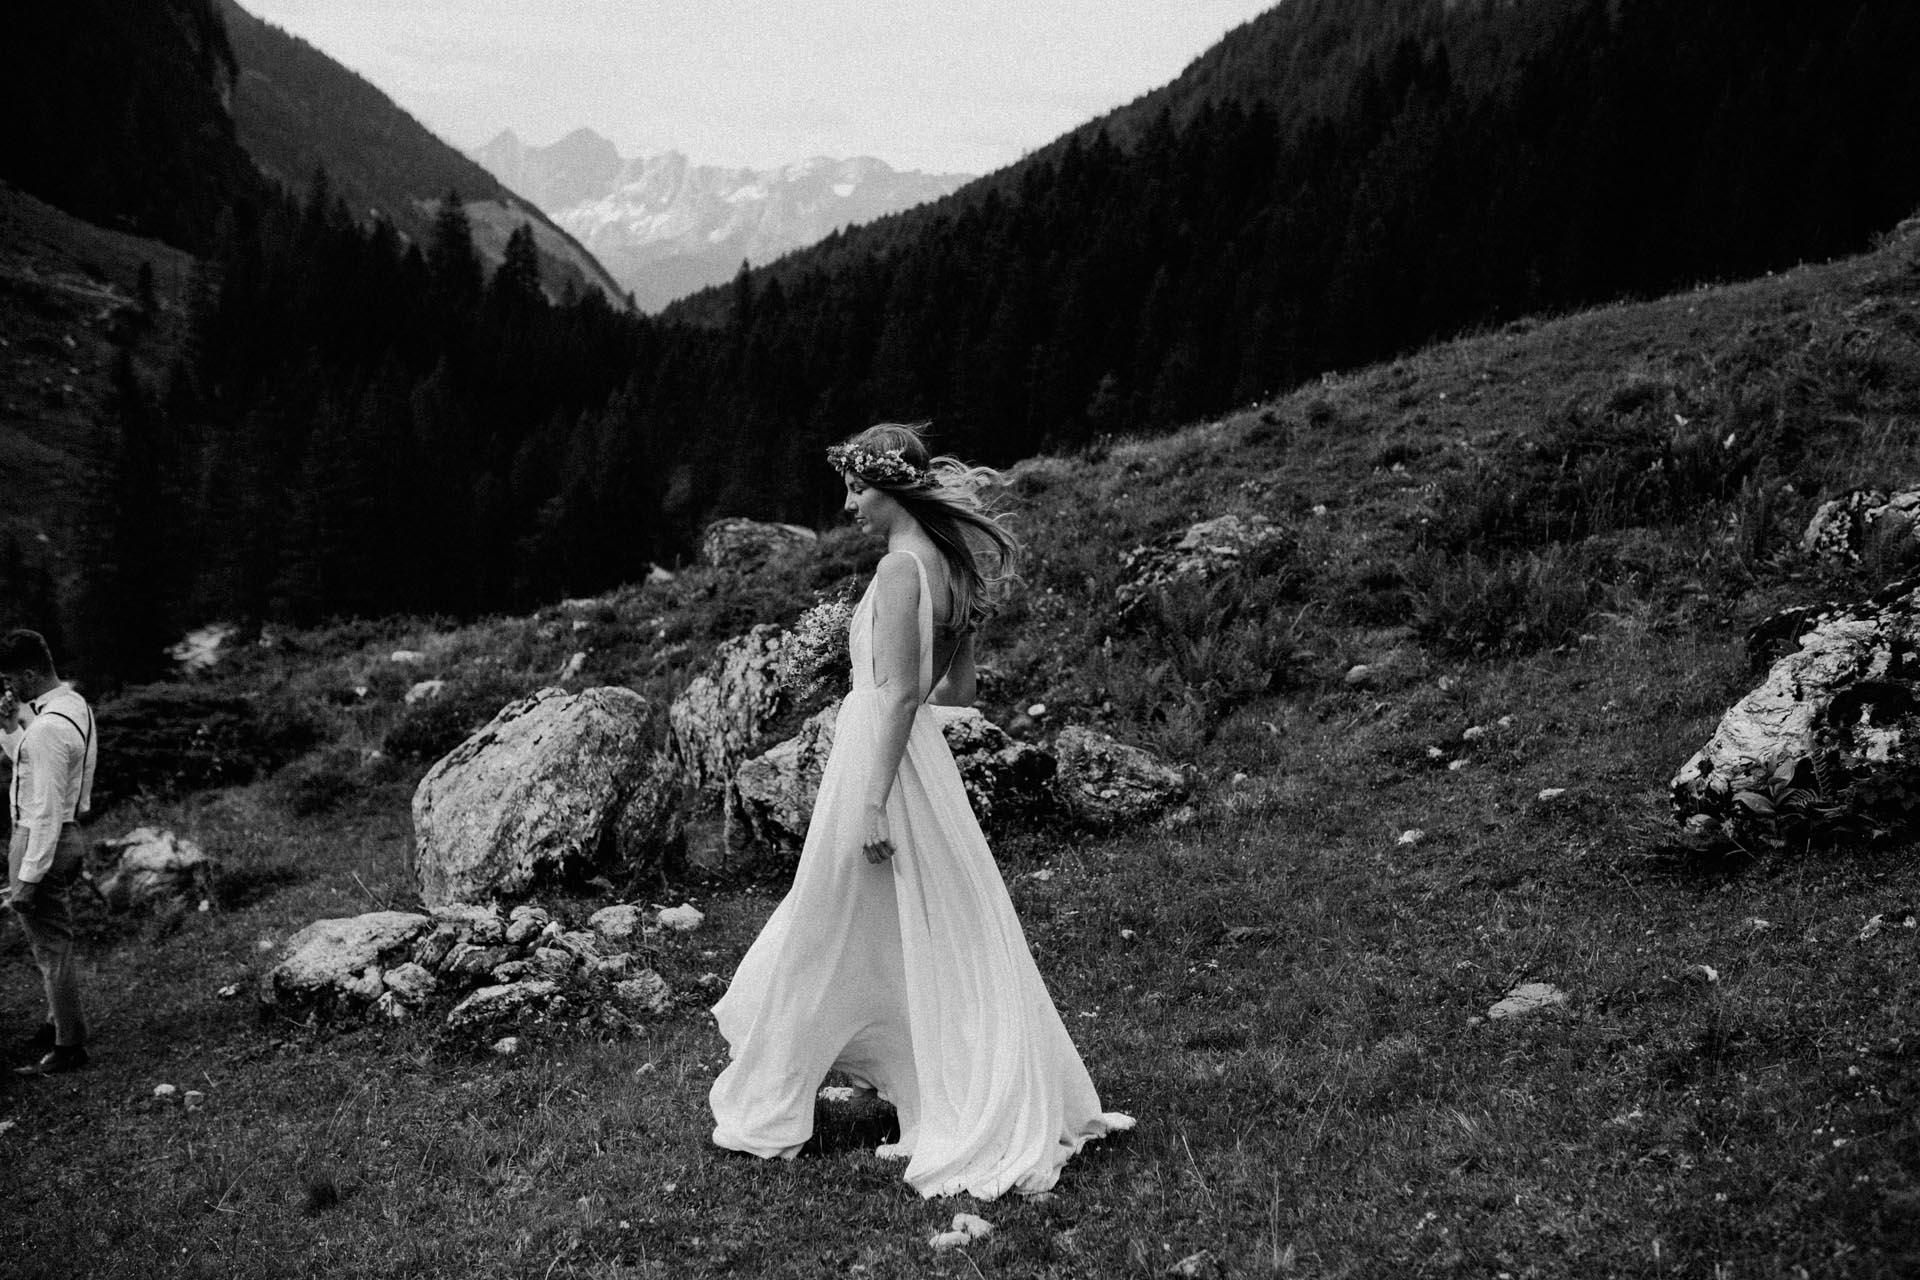 vienna-wedding-photographer-agnesundandi-weddingshooting-schladming-93